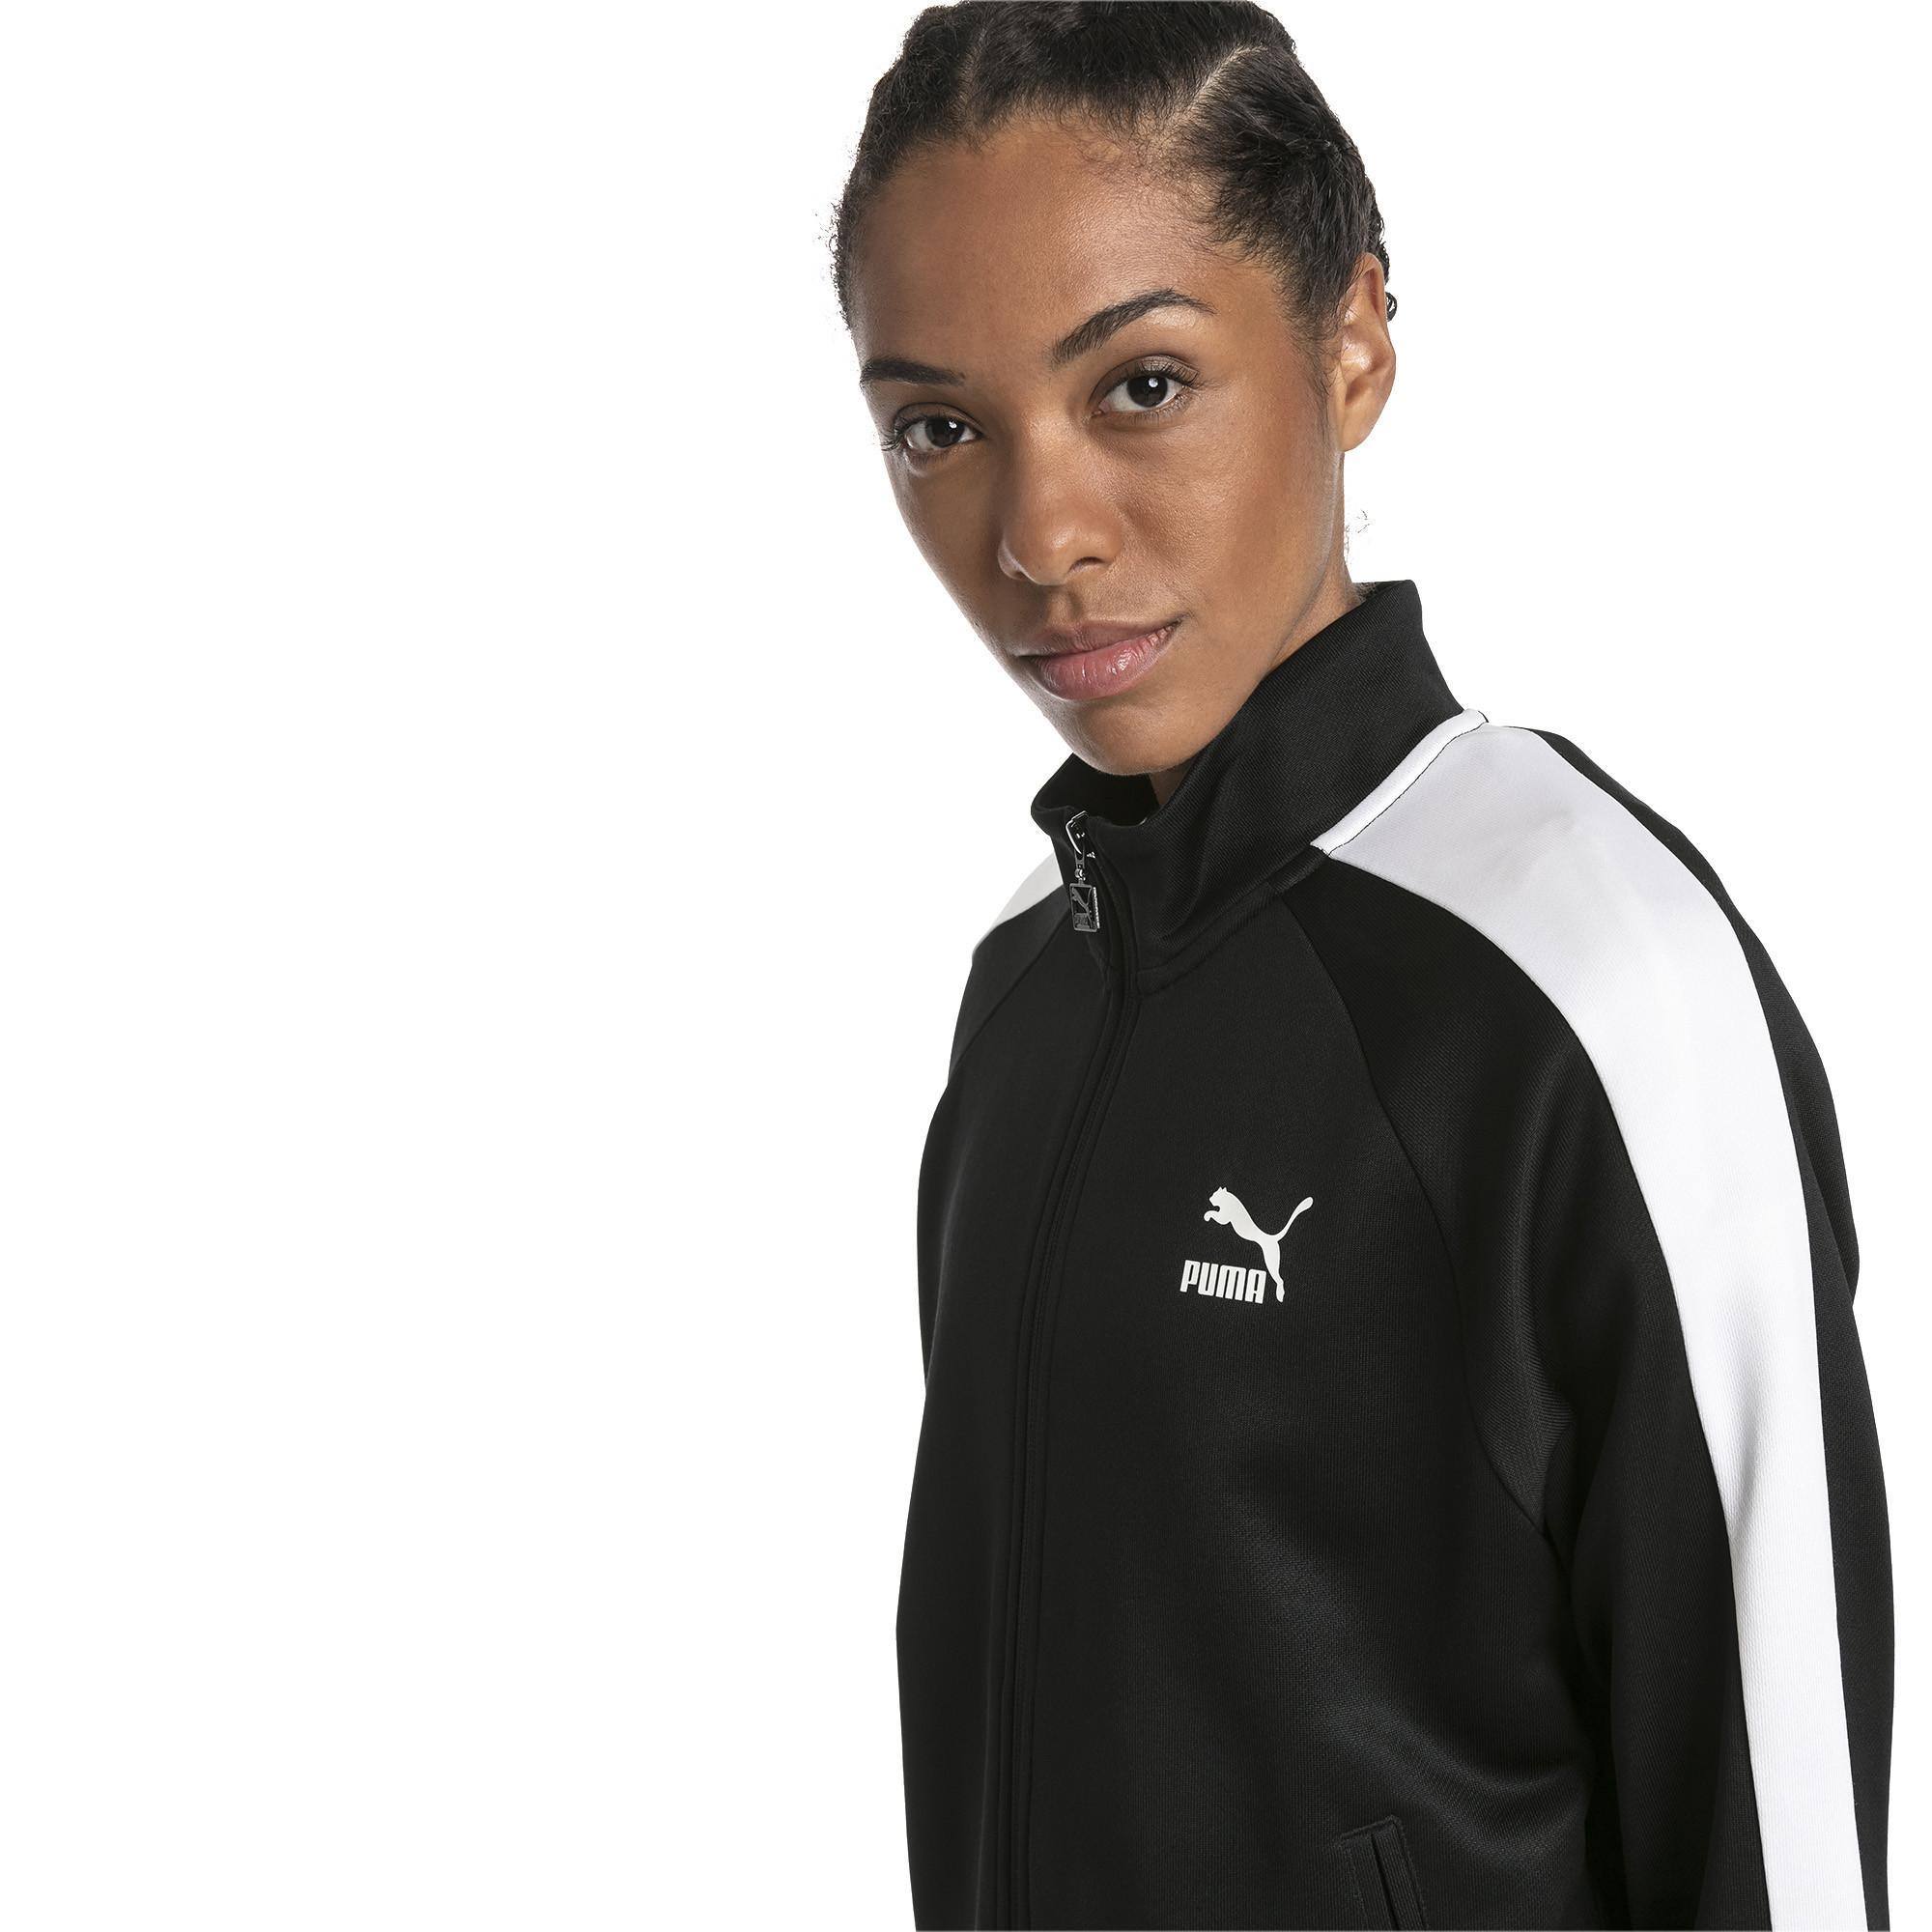 d7bcdded23 Latest PUMA,Lacoste Women's Hoodies Products | Enjoy Huge Discounts ...